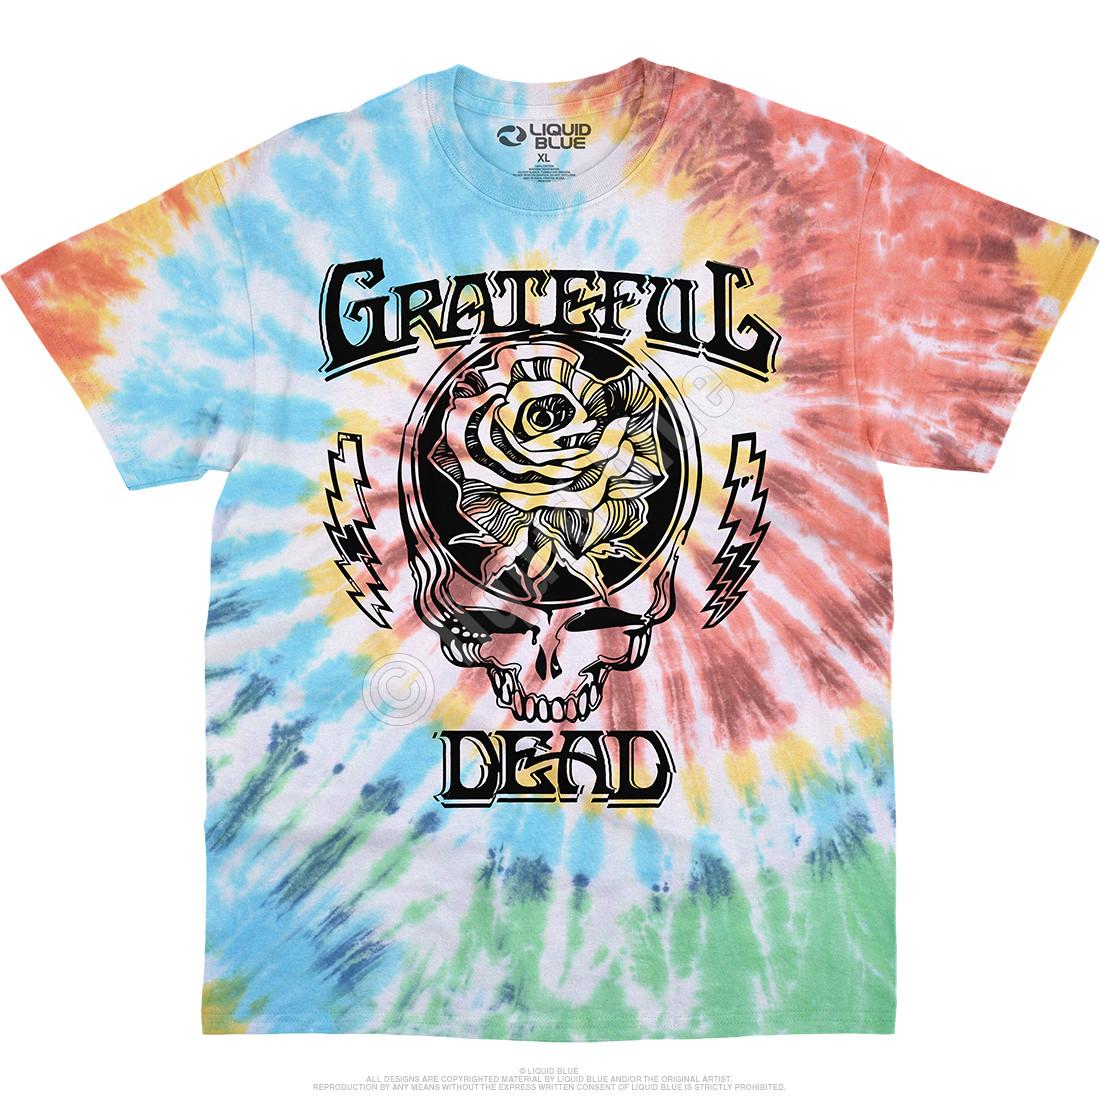 Roosevelt Tie-Dye T-Shirt